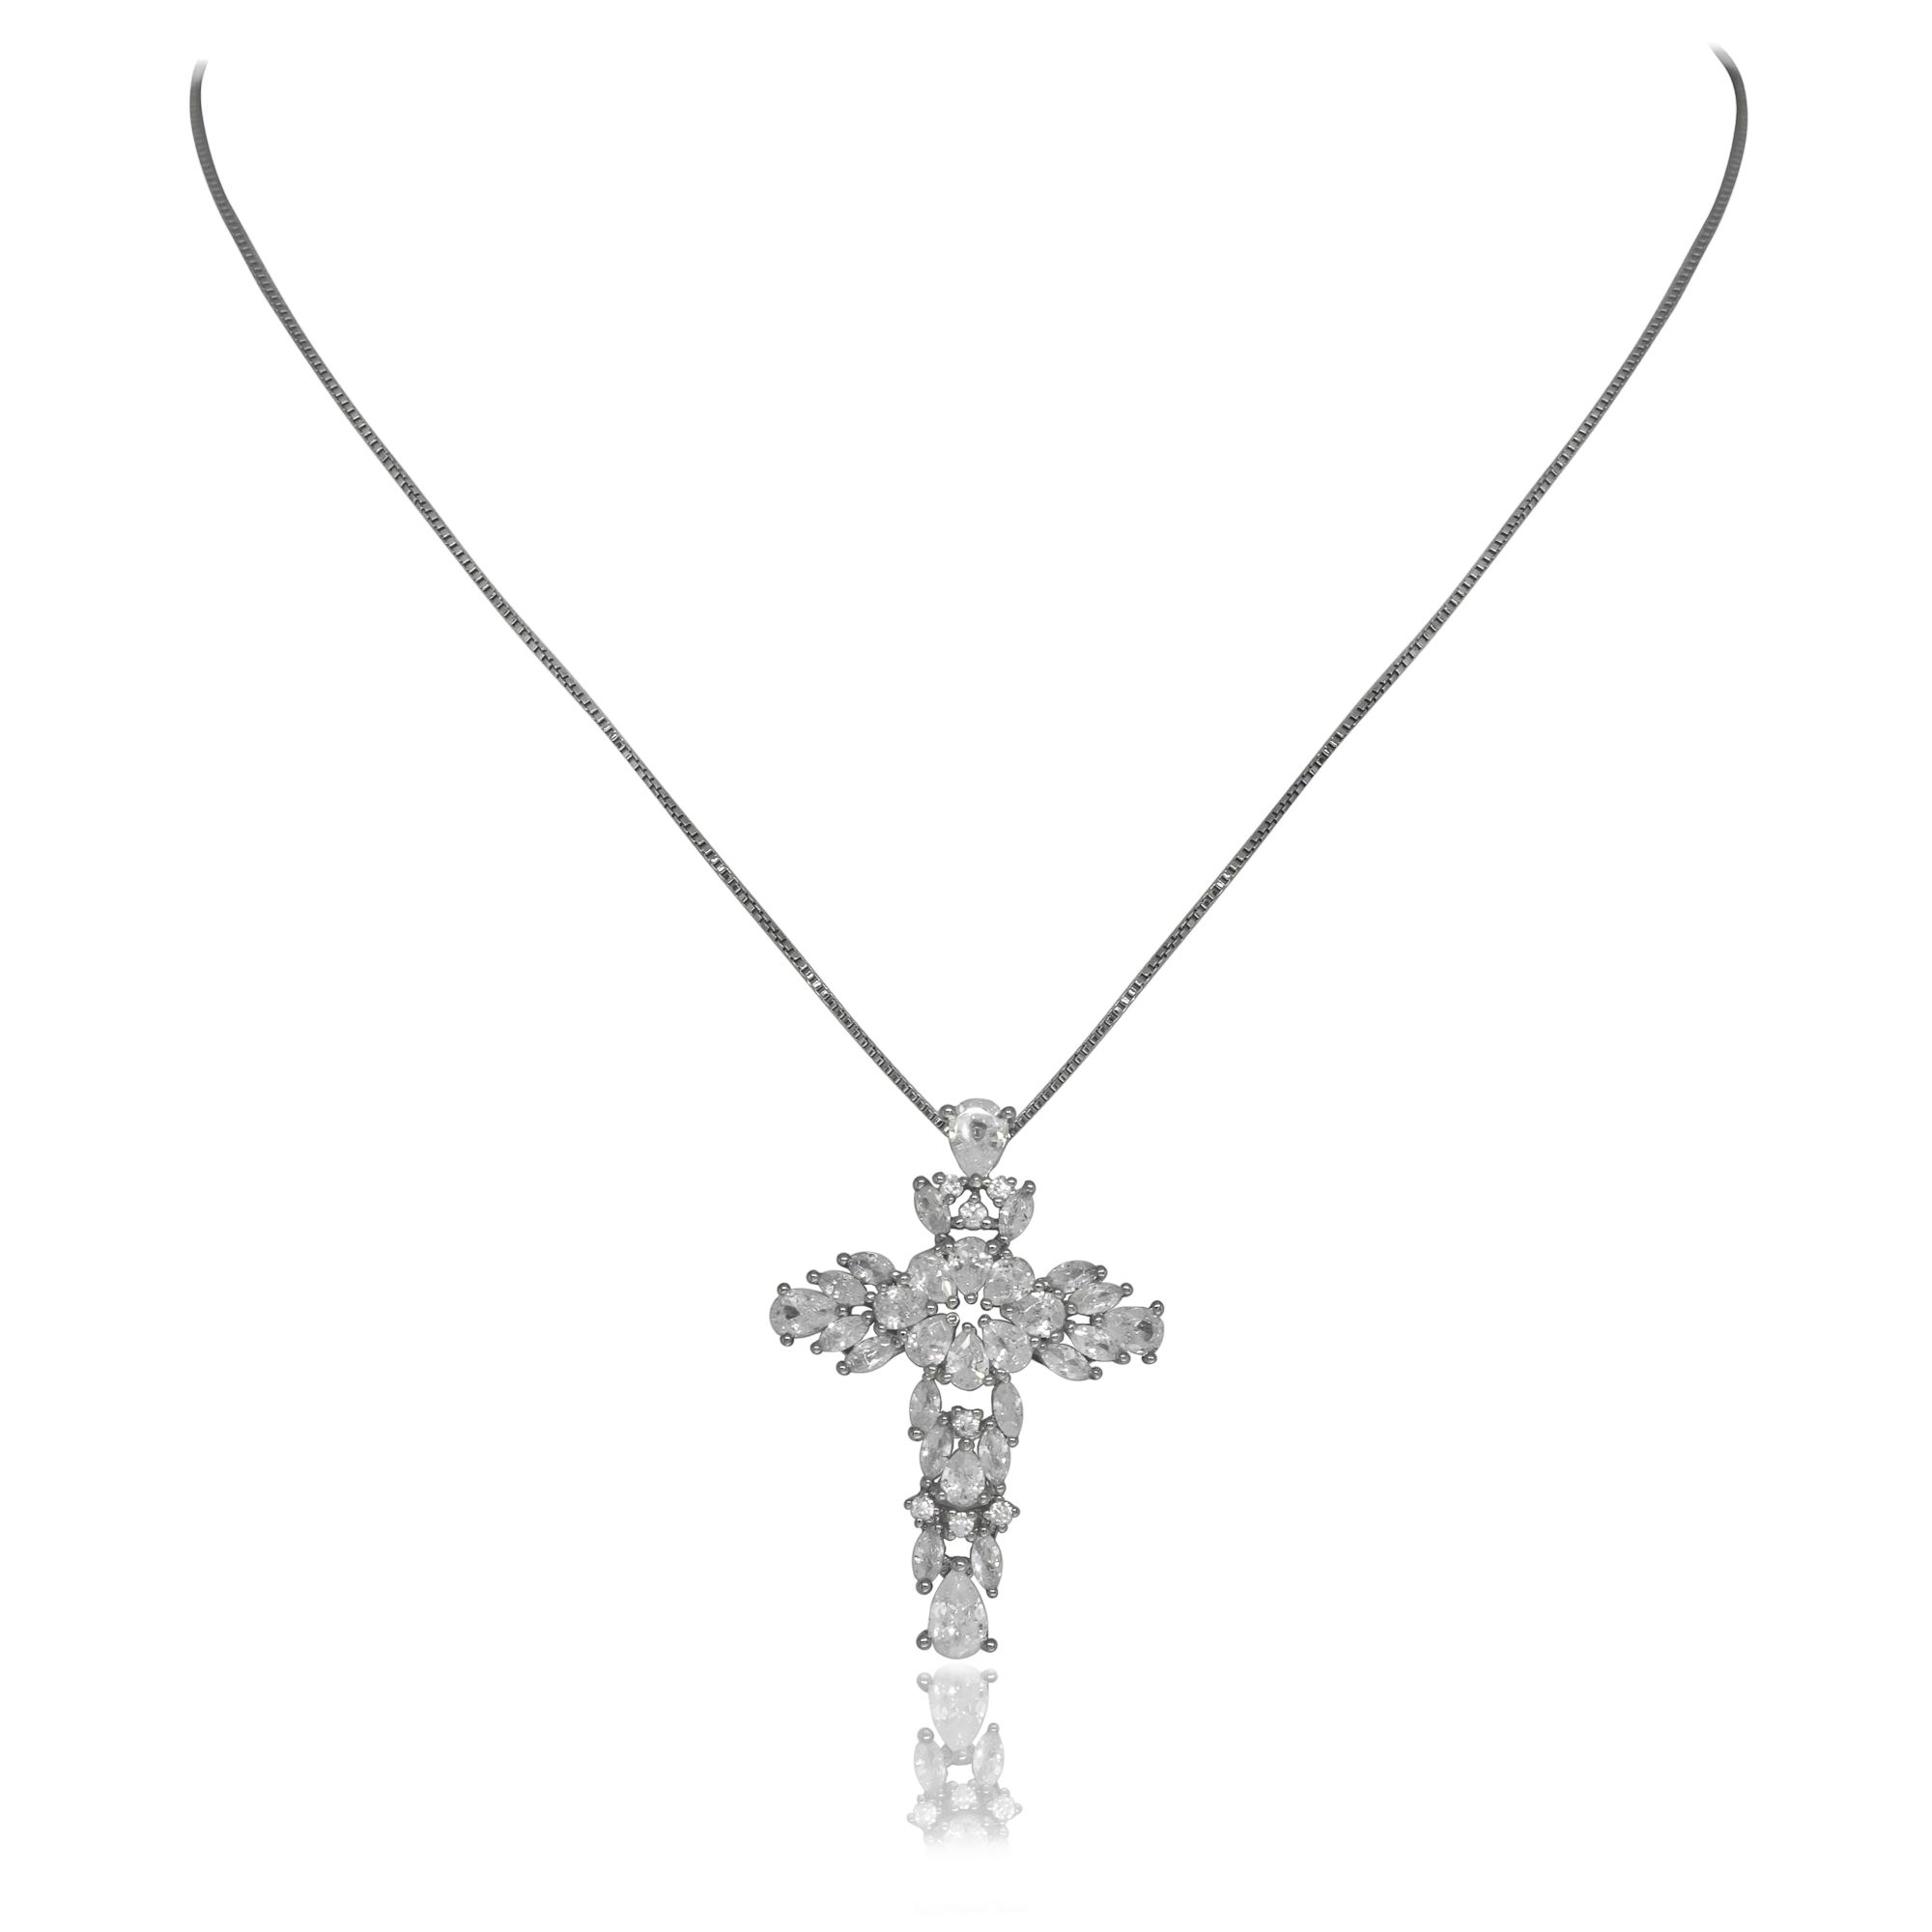 Colar Gargantilha Semi joia crucifixo em Zircônia banhado a ouro 18k ou rhodium